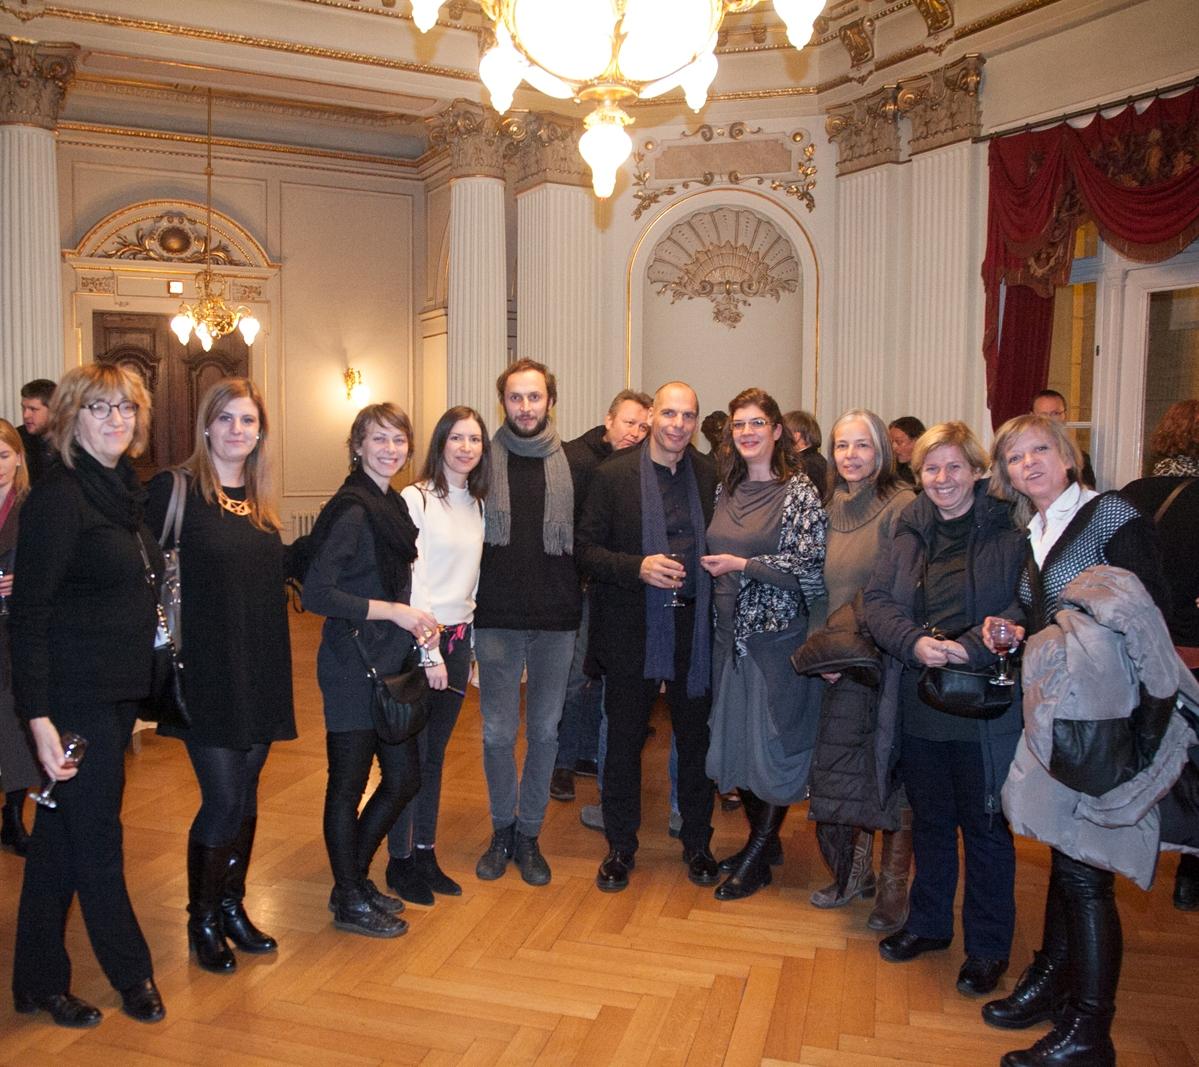 Croatian National Theatre, Philosophical theatre, Dec 4th 2016, Yanis Varoufakis and Srećko Horvat with Belgrade and Zagreb DiEM25 members